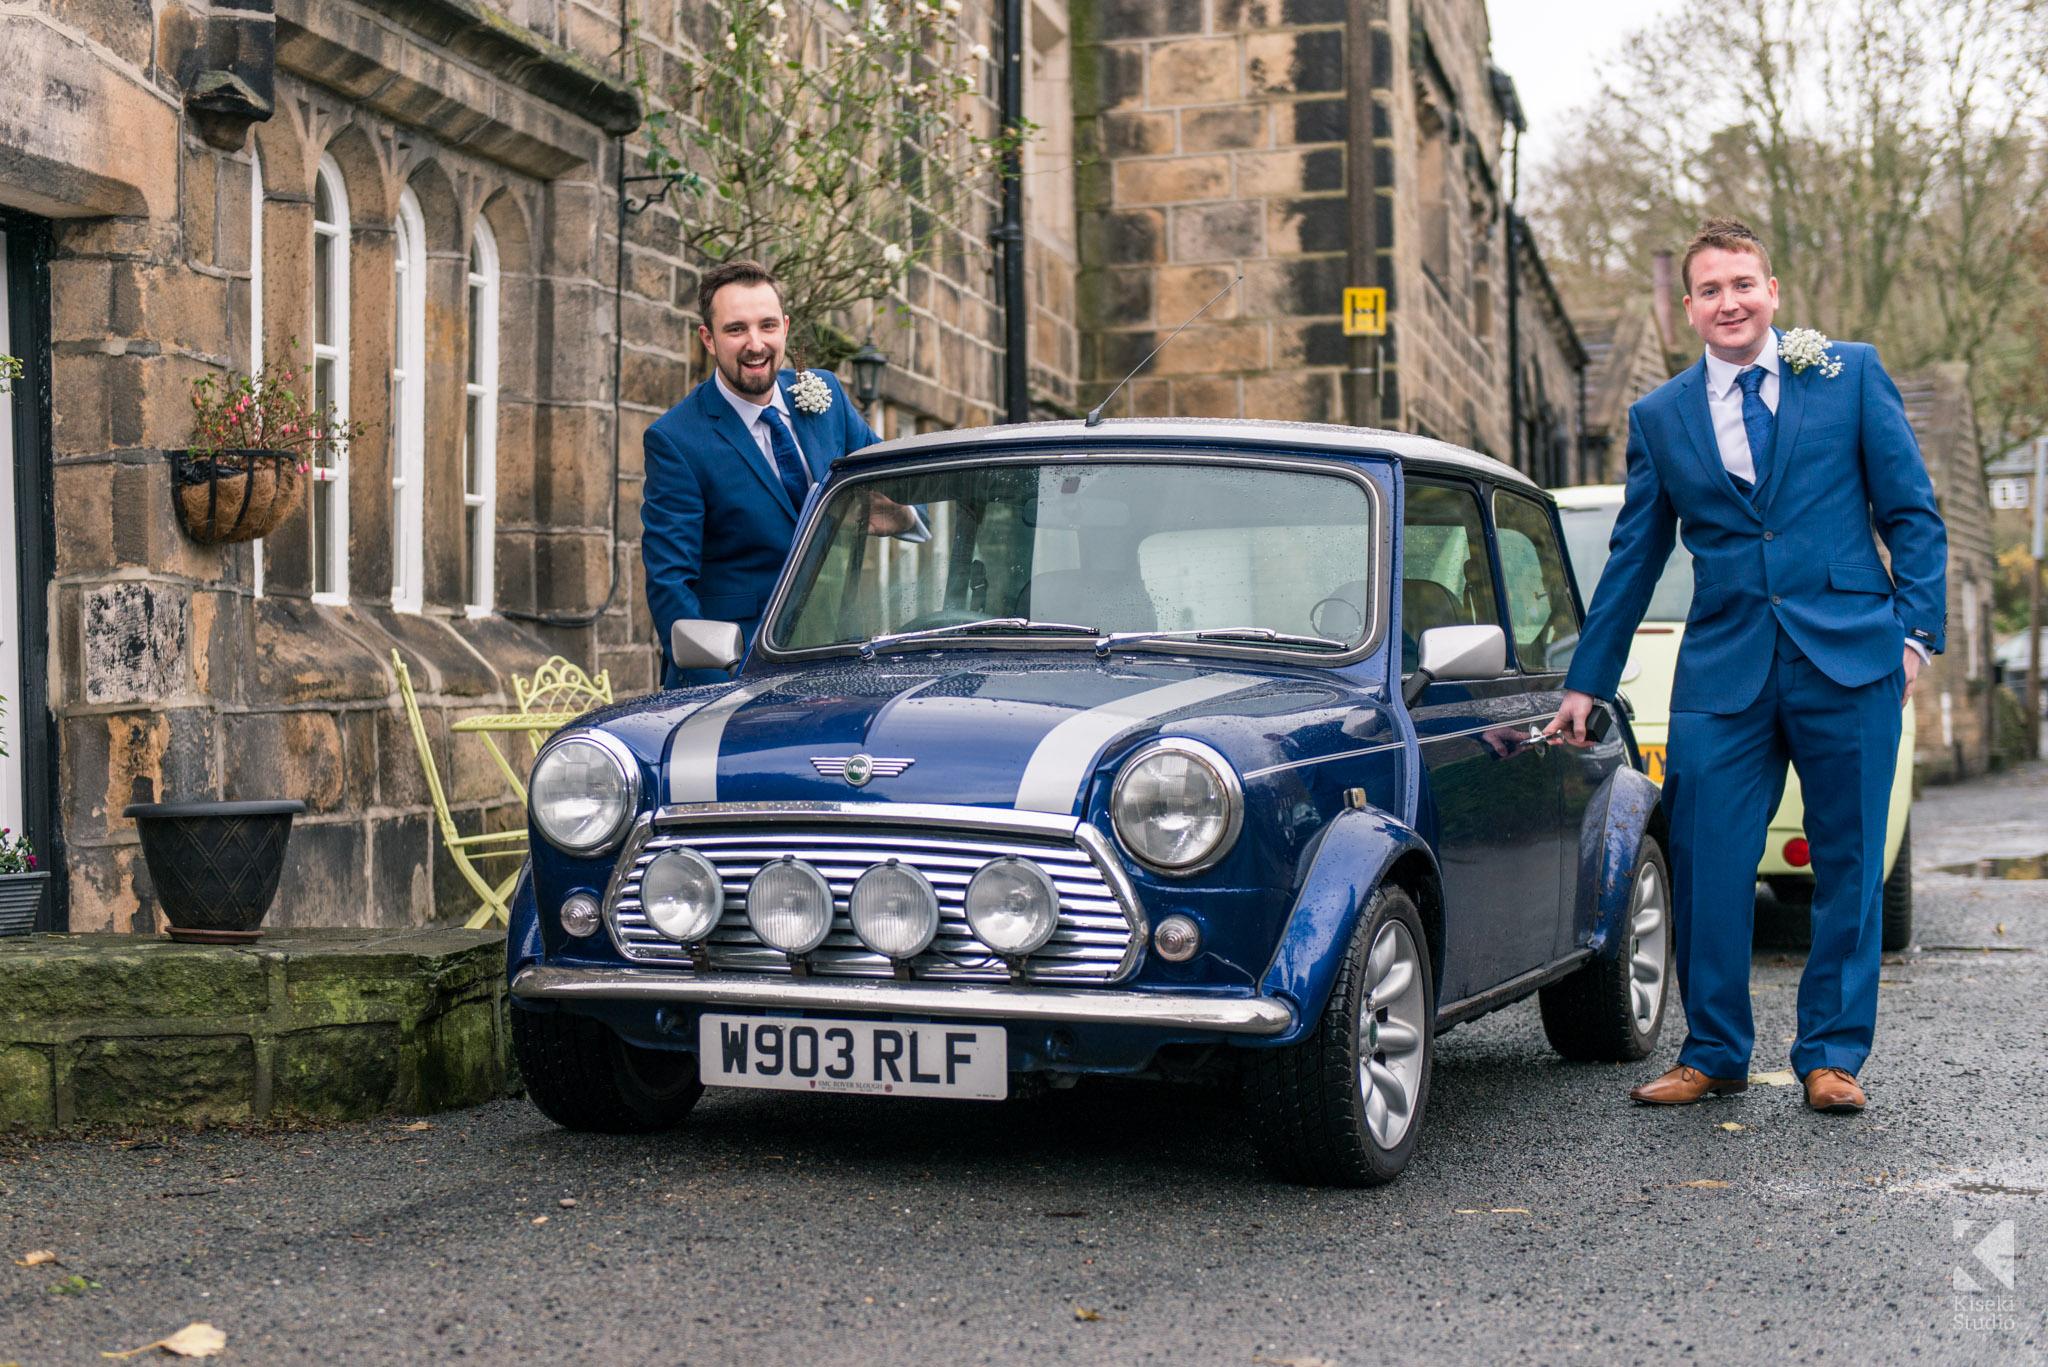 Groomsmen in the Mini Cooper classic